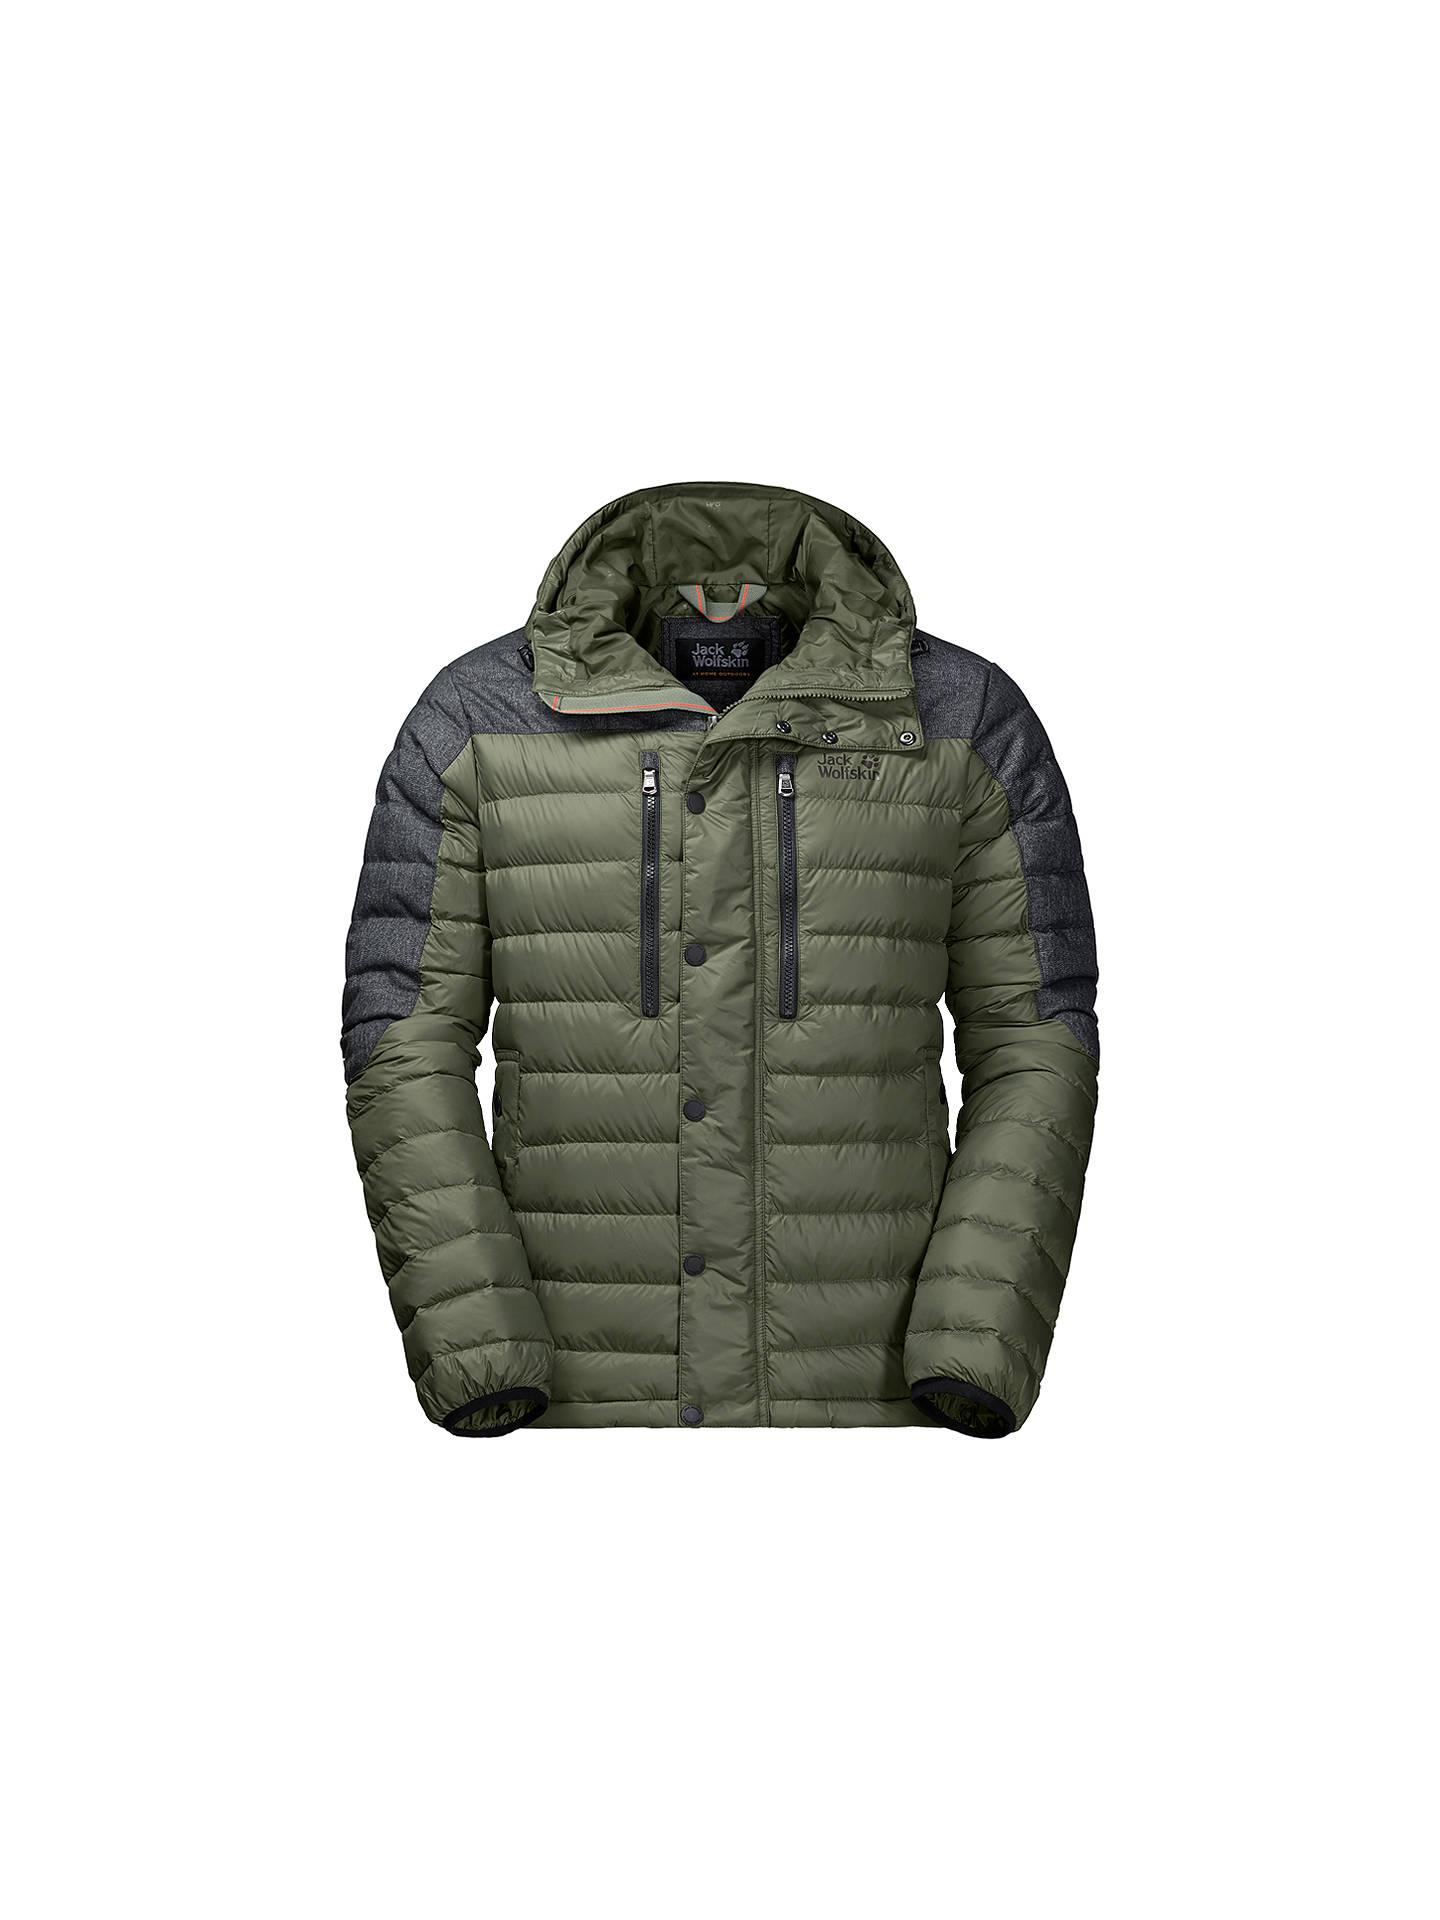 5fca0bad4f ... Buy Jack Wolfskin Richmond Men's Down Jacket, Green, S Online at  johnlewis.com